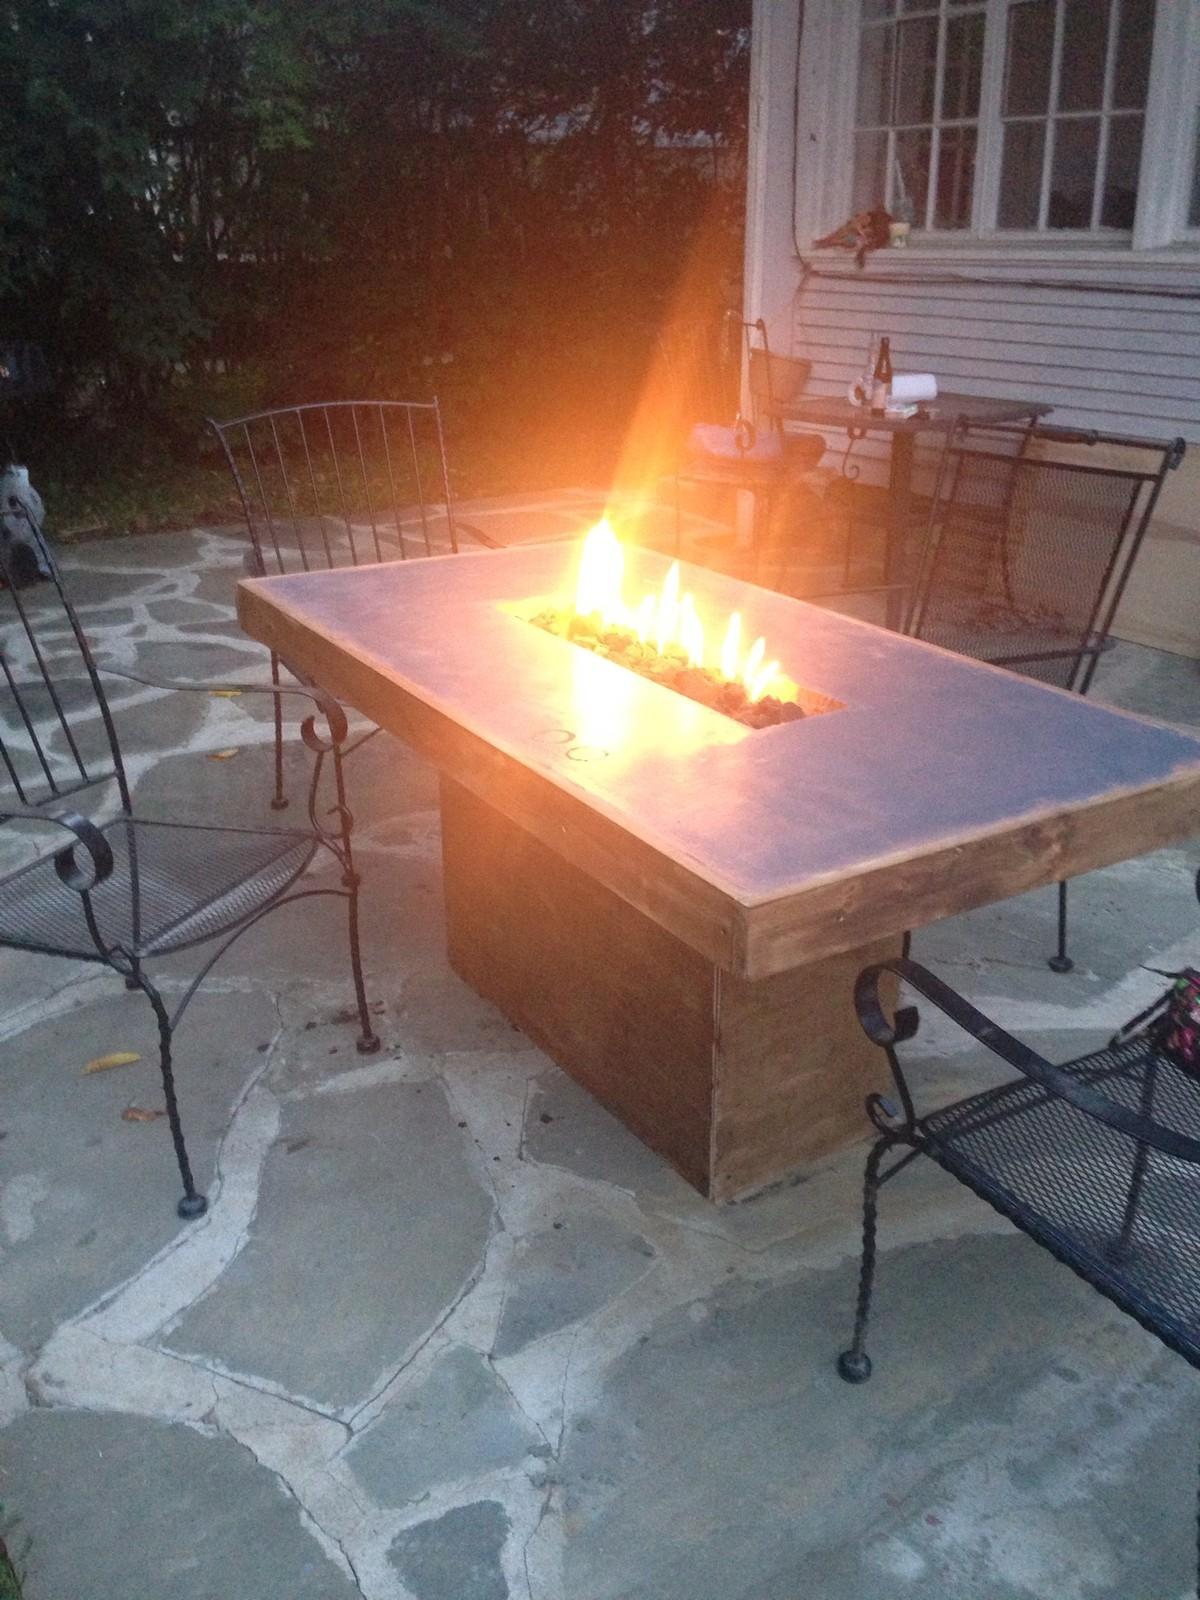 concrete fire table fire pit custom ebay outdoors glass fire pit fire pit table set fire. Black Bedroom Furniture Sets. Home Design Ideas